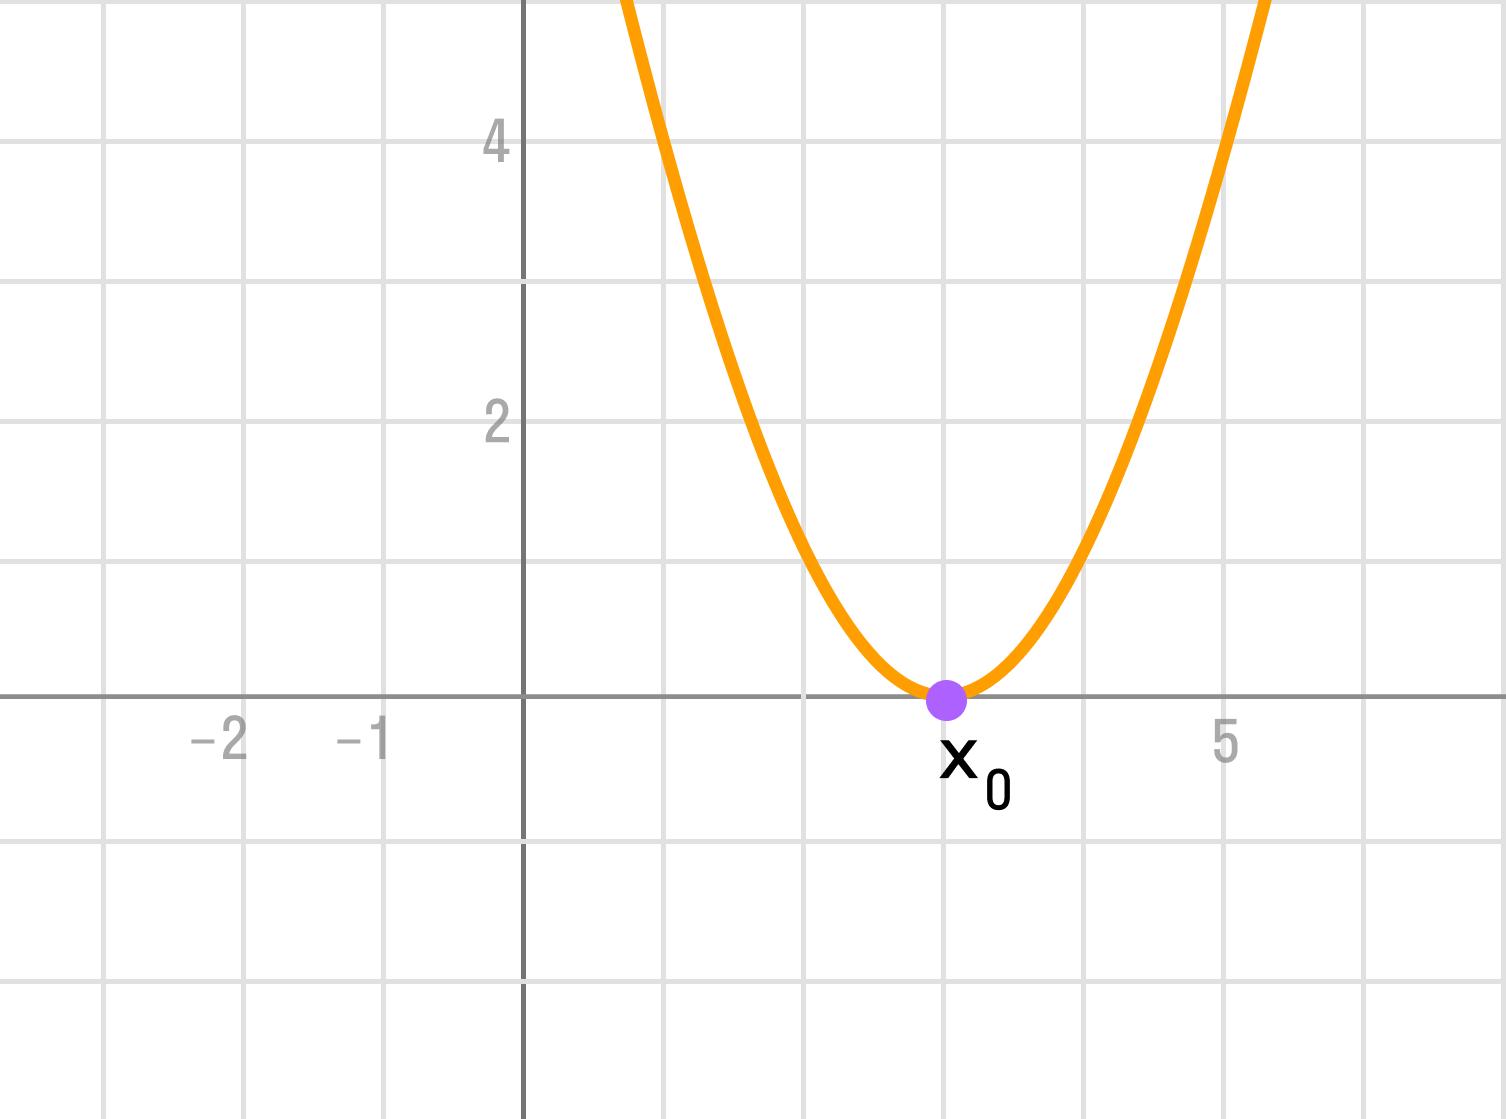 график при условии D = 0